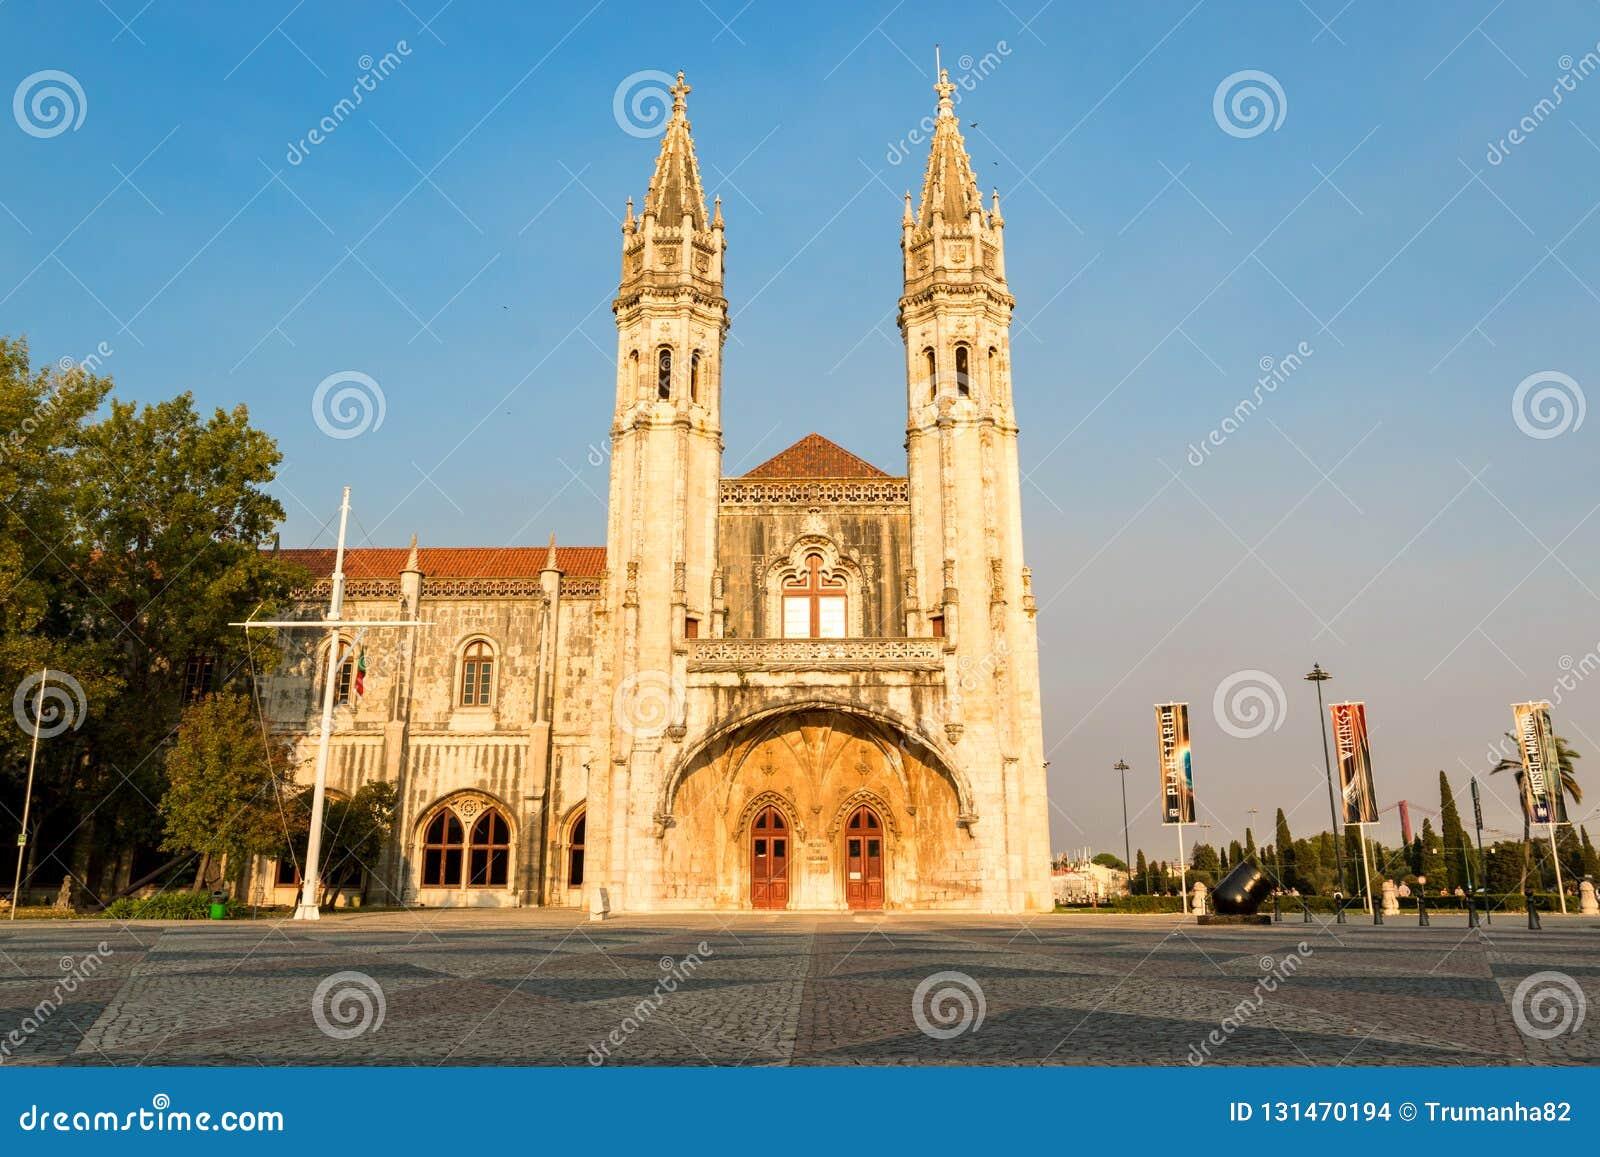 Jeronimos-Kloster in Belem, Lissabon, Portugal an der Dämmerung